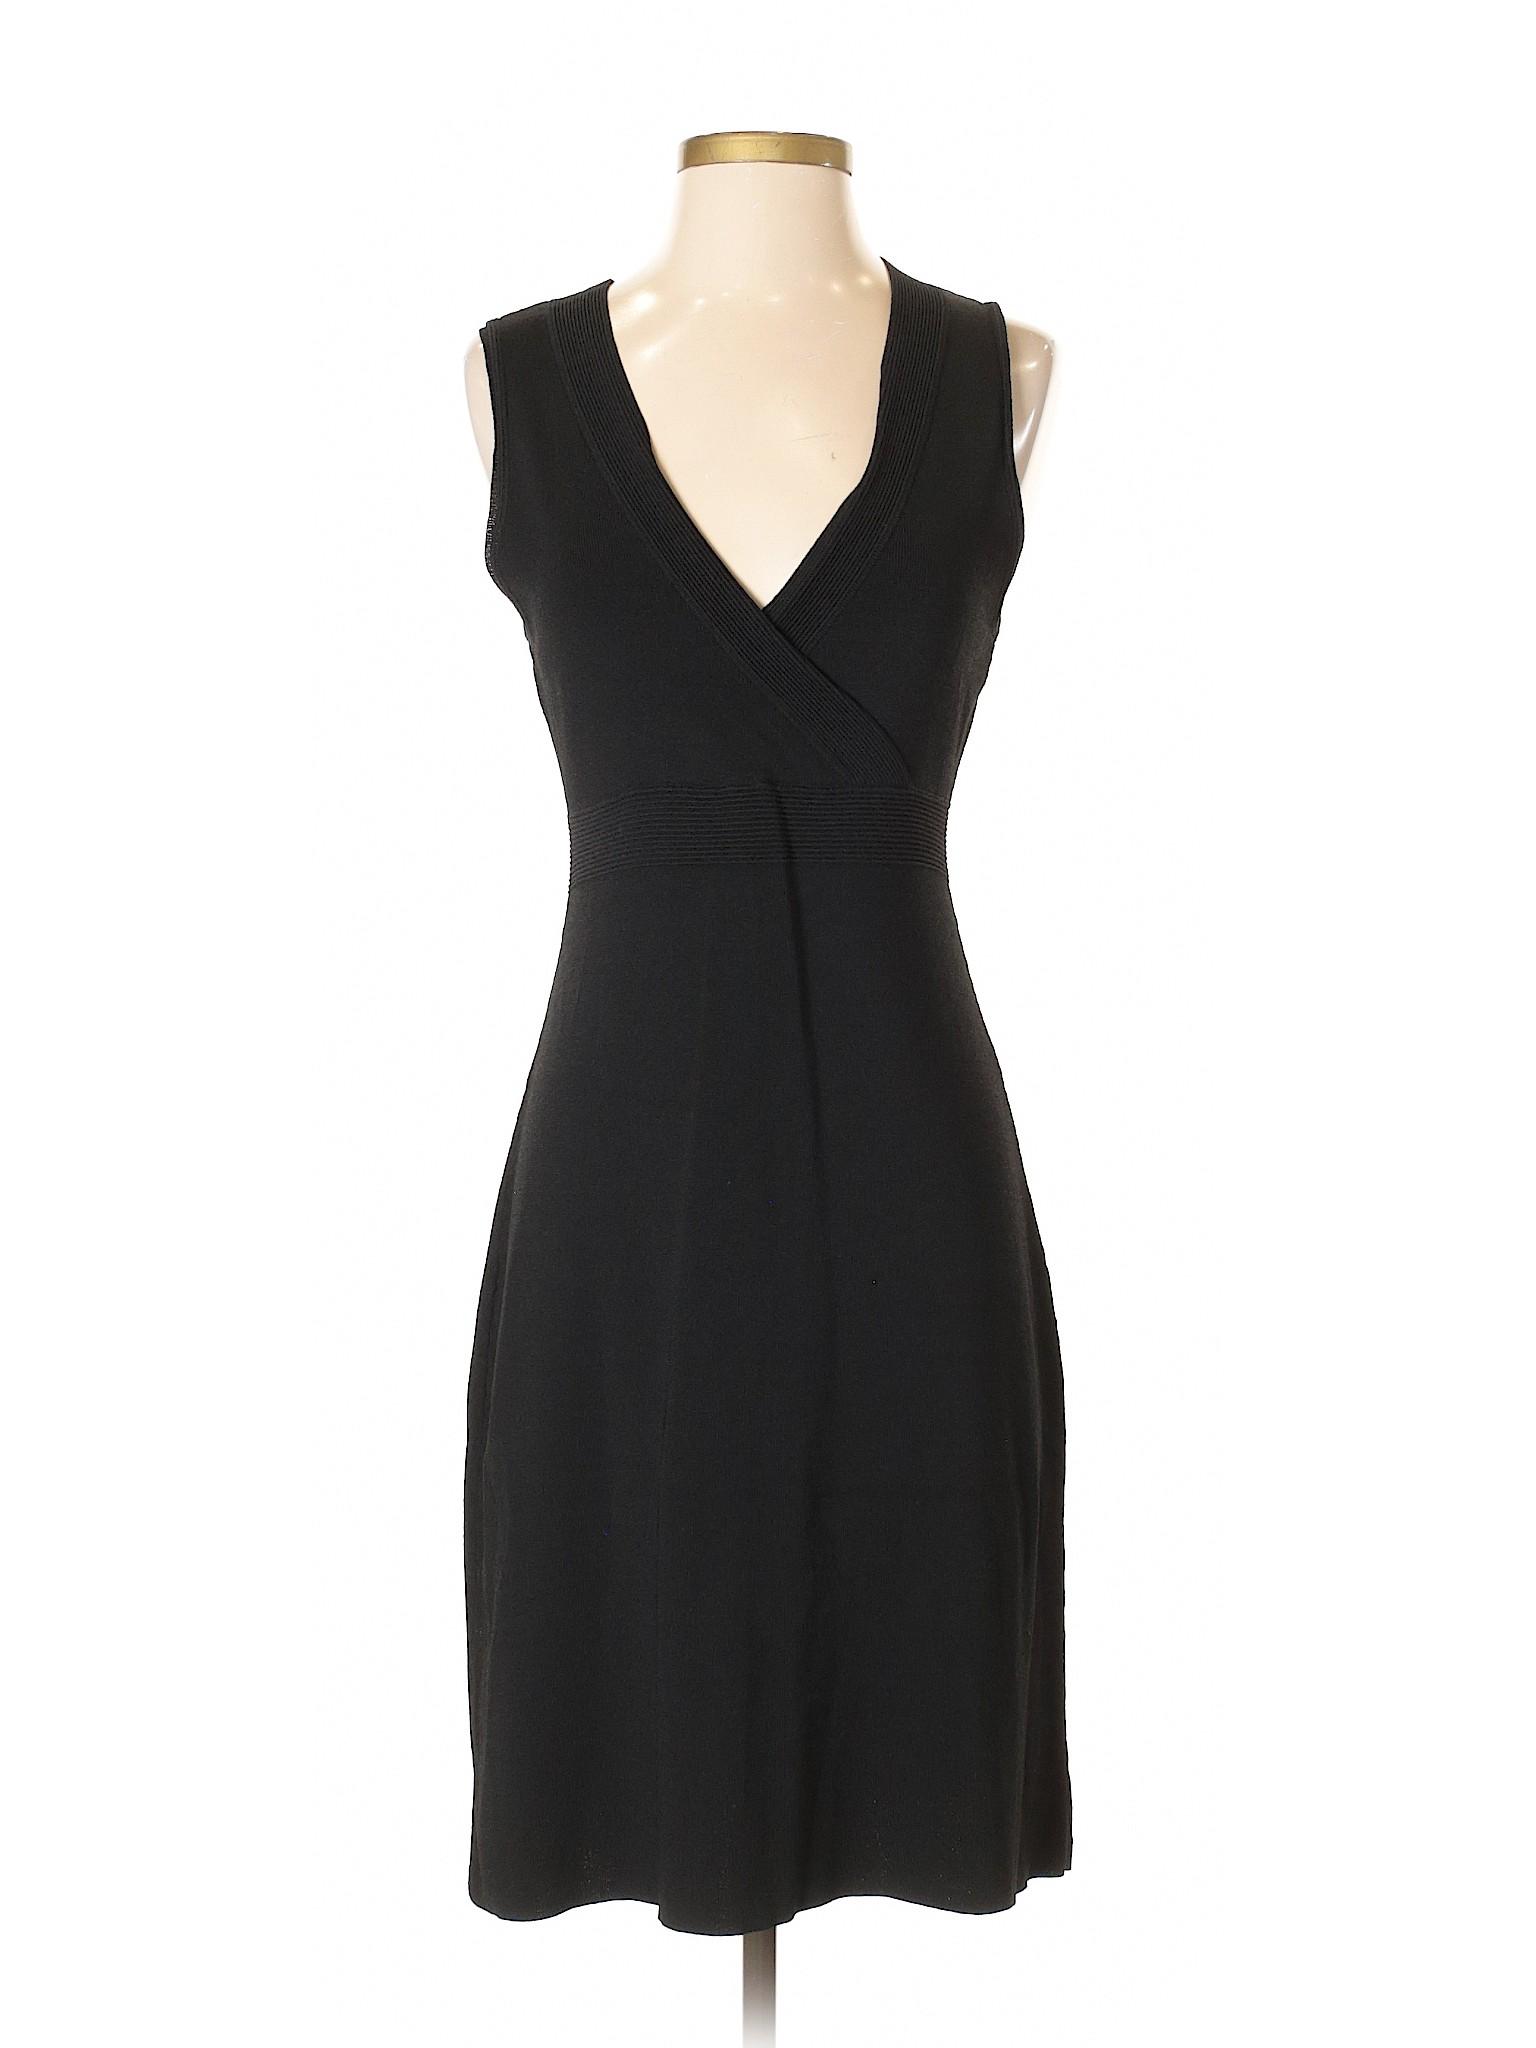 Boutique Dress Taylor Casual winter Ann wCHTCRWqf